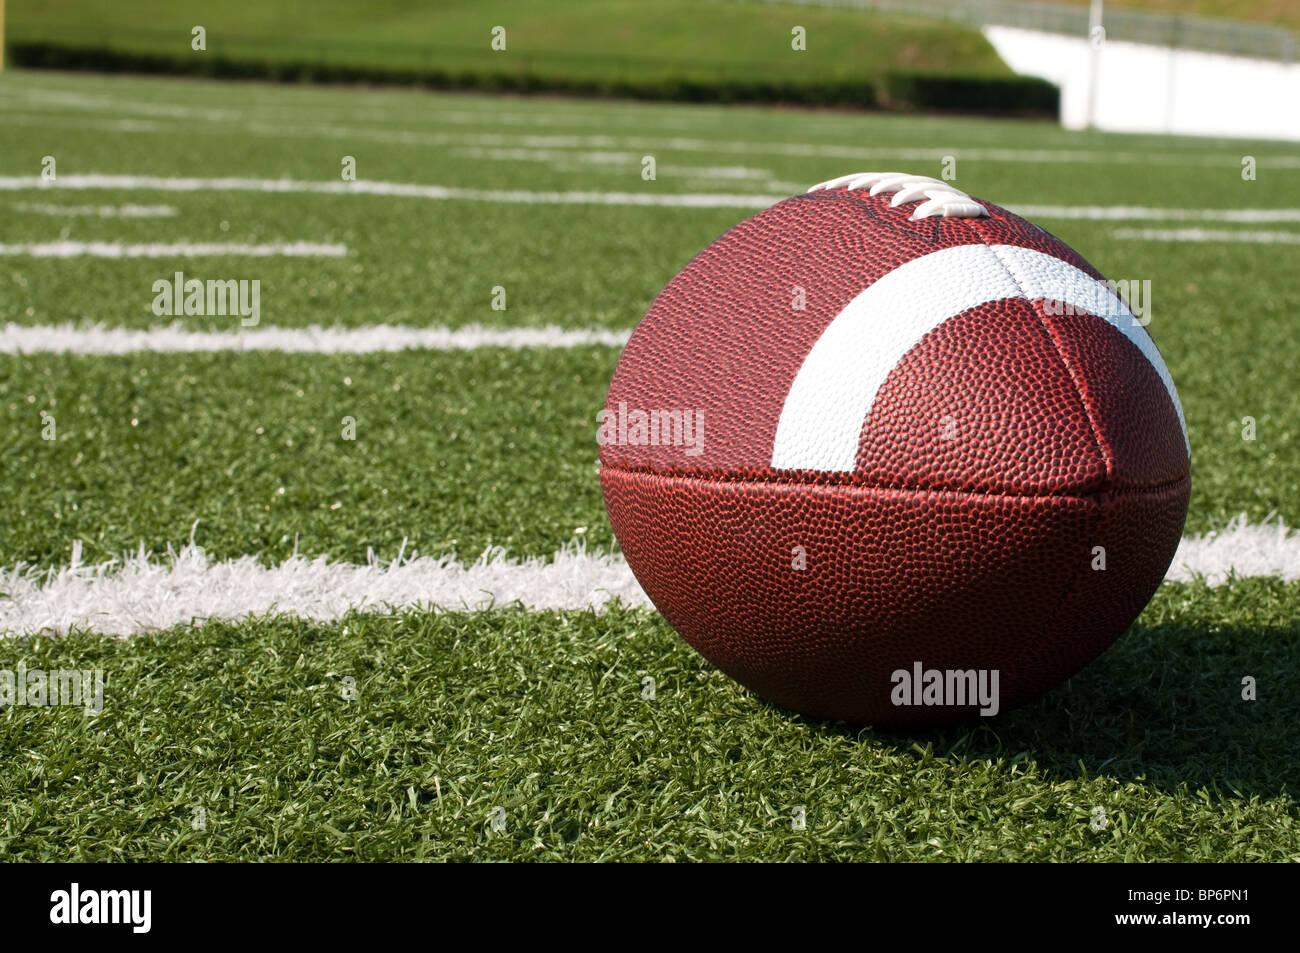 Libre du football américain sur le terrain. Photo Stock